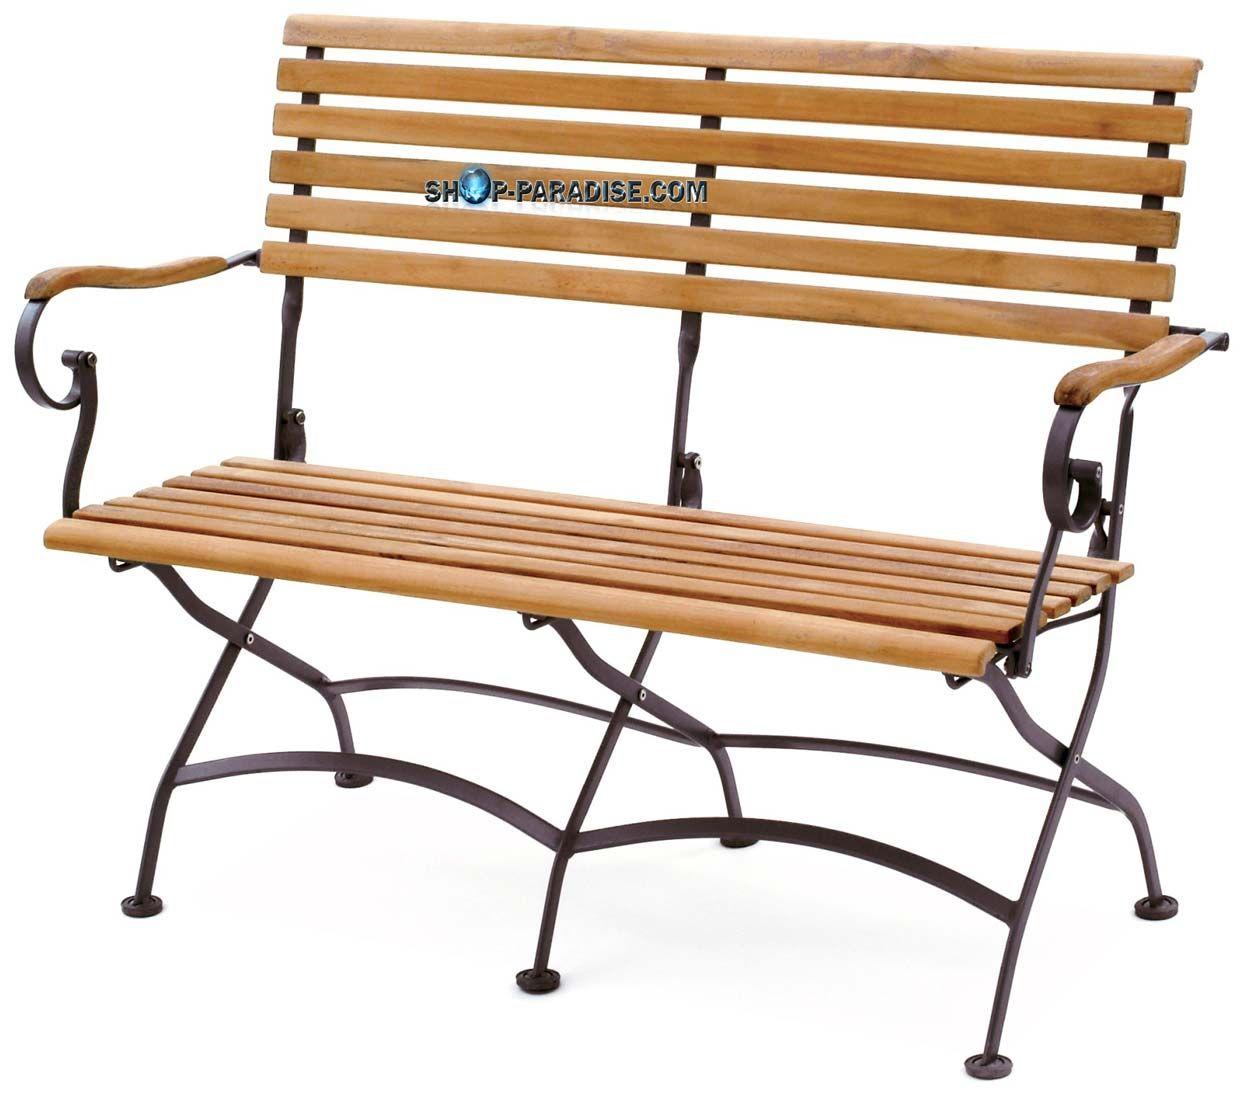 SHOP-PARADISE.COM Teak Gartenbank Apatura 235,29 € http://shop ...